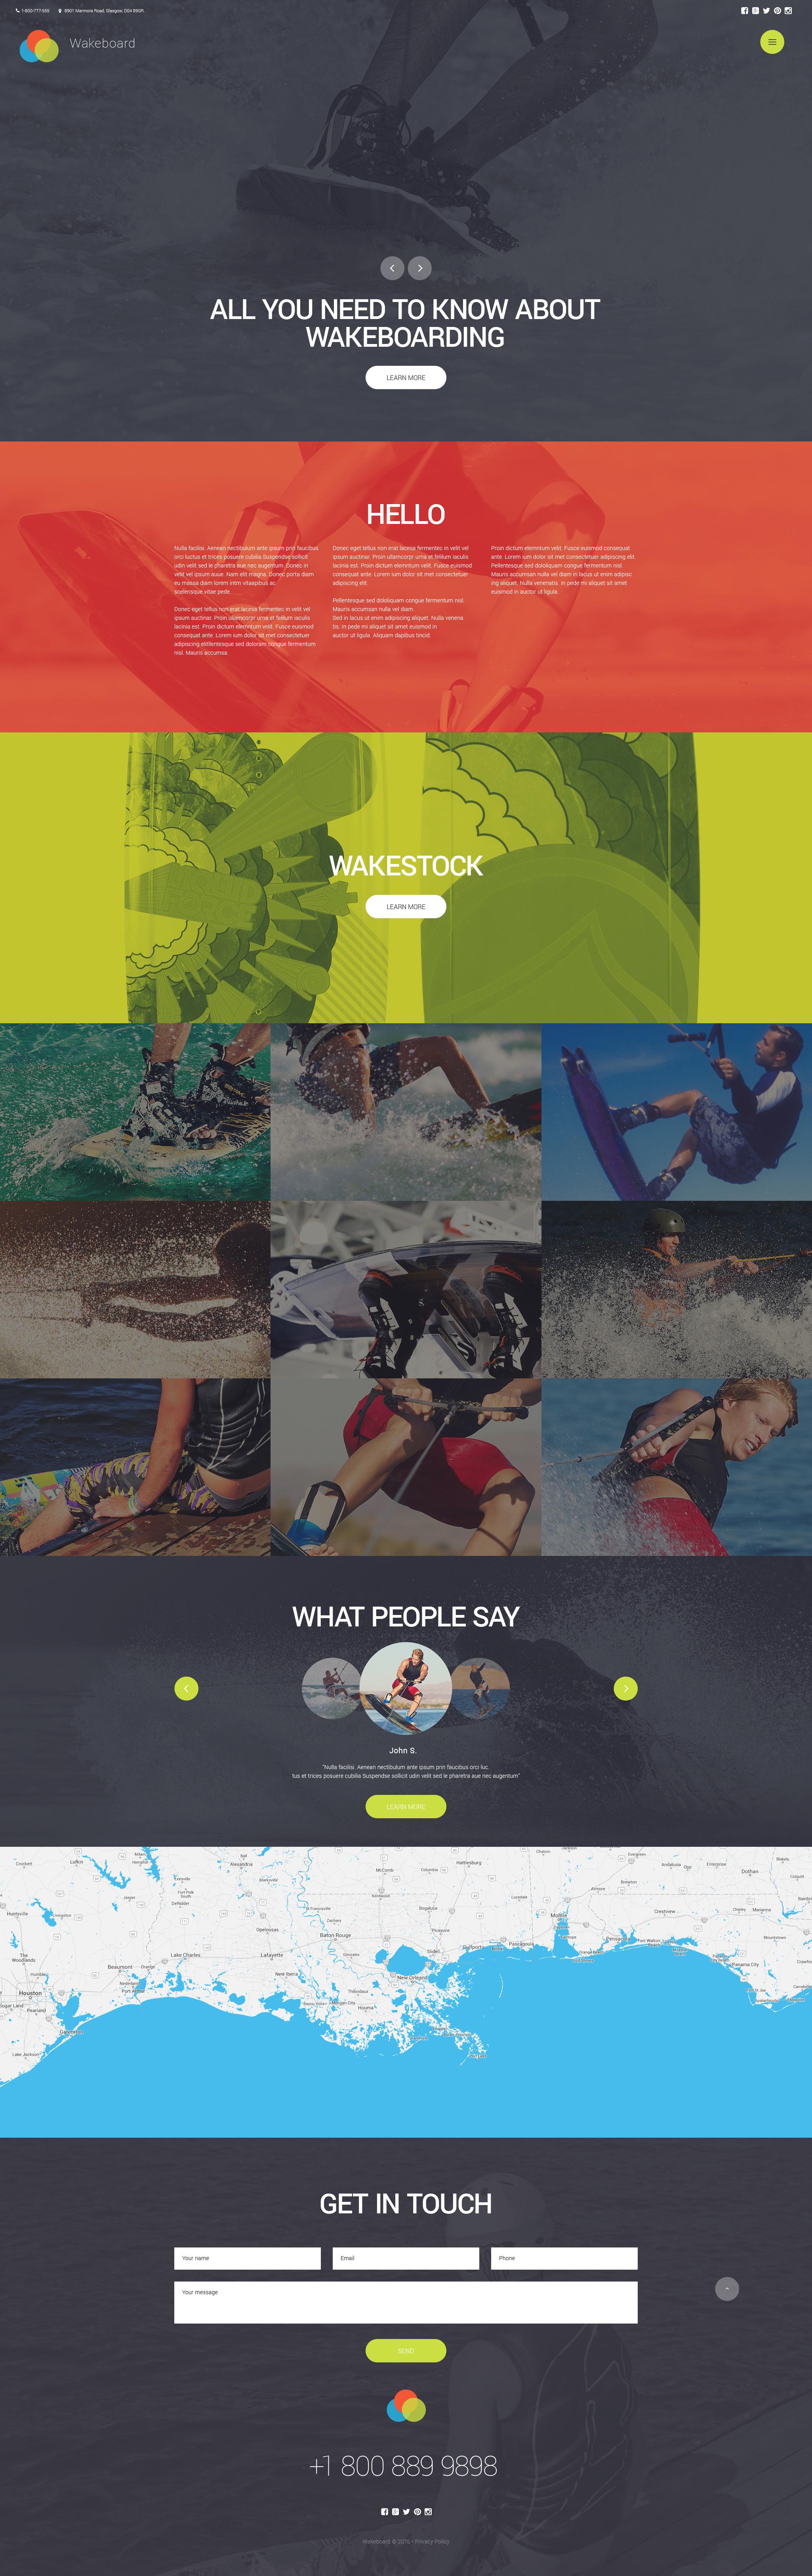 Responsivt Wakeboarding Club Hemsidemall #56072